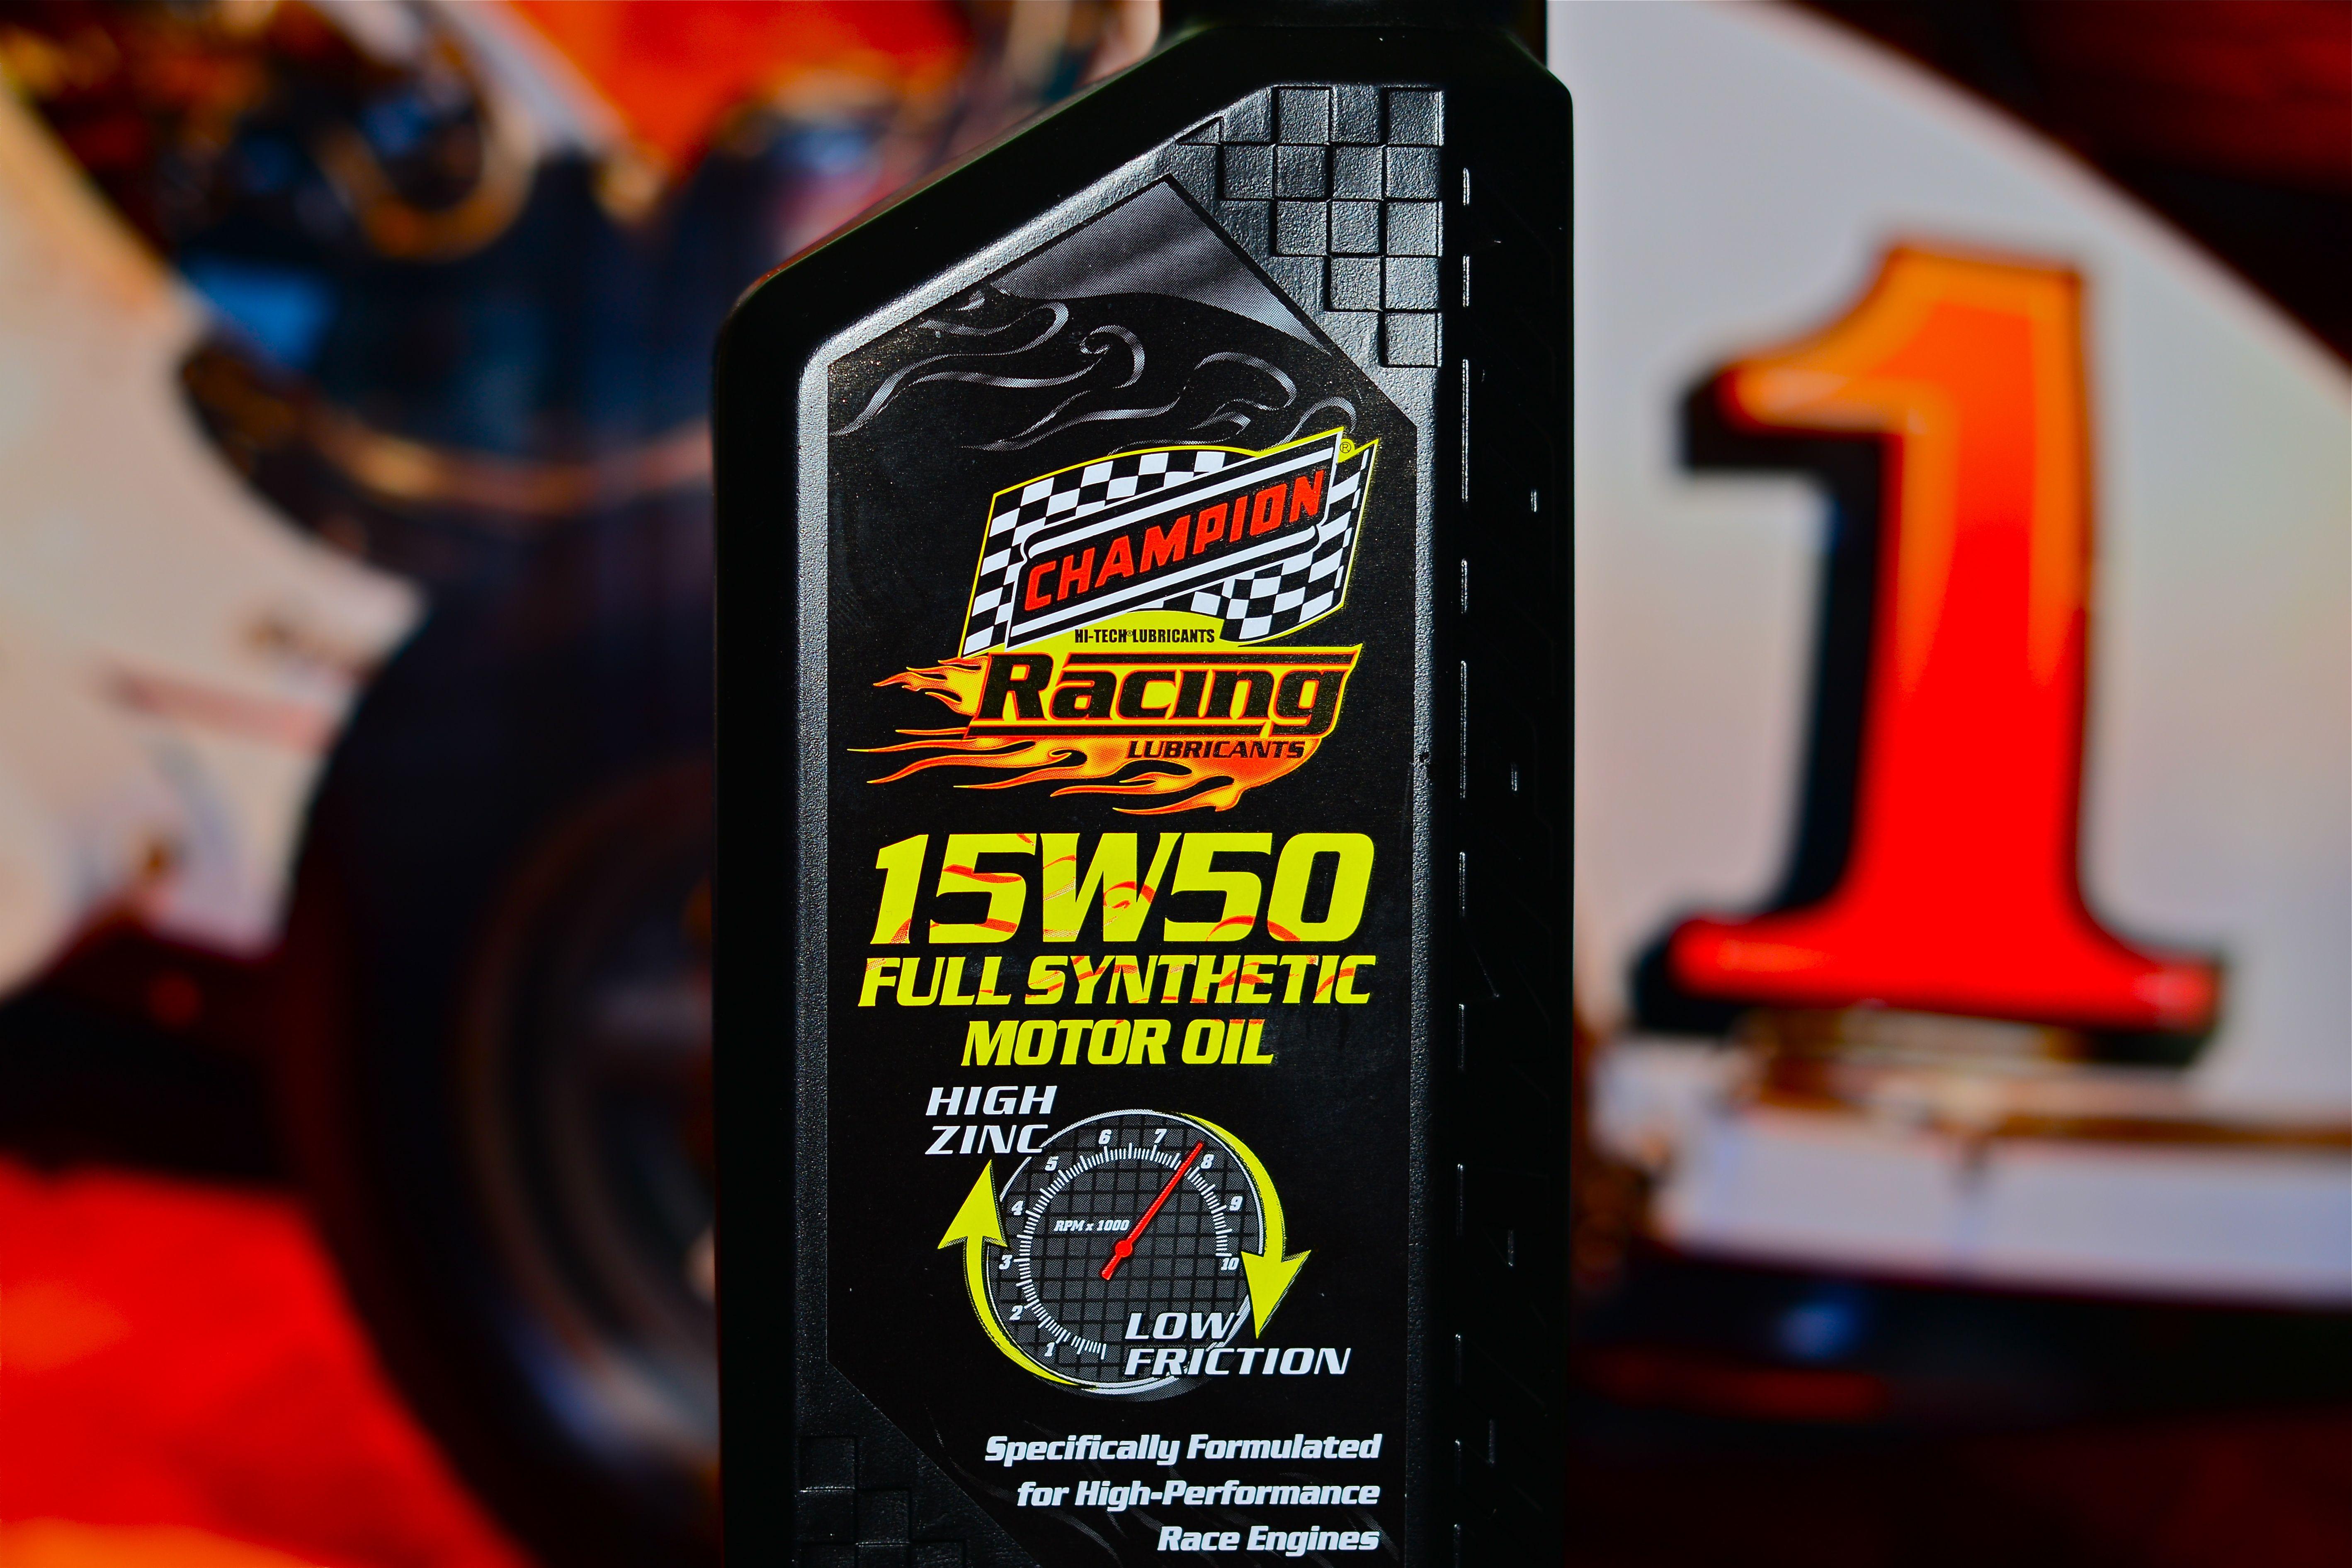 Brett Hearn Wins Again Using Champion Racing Oil